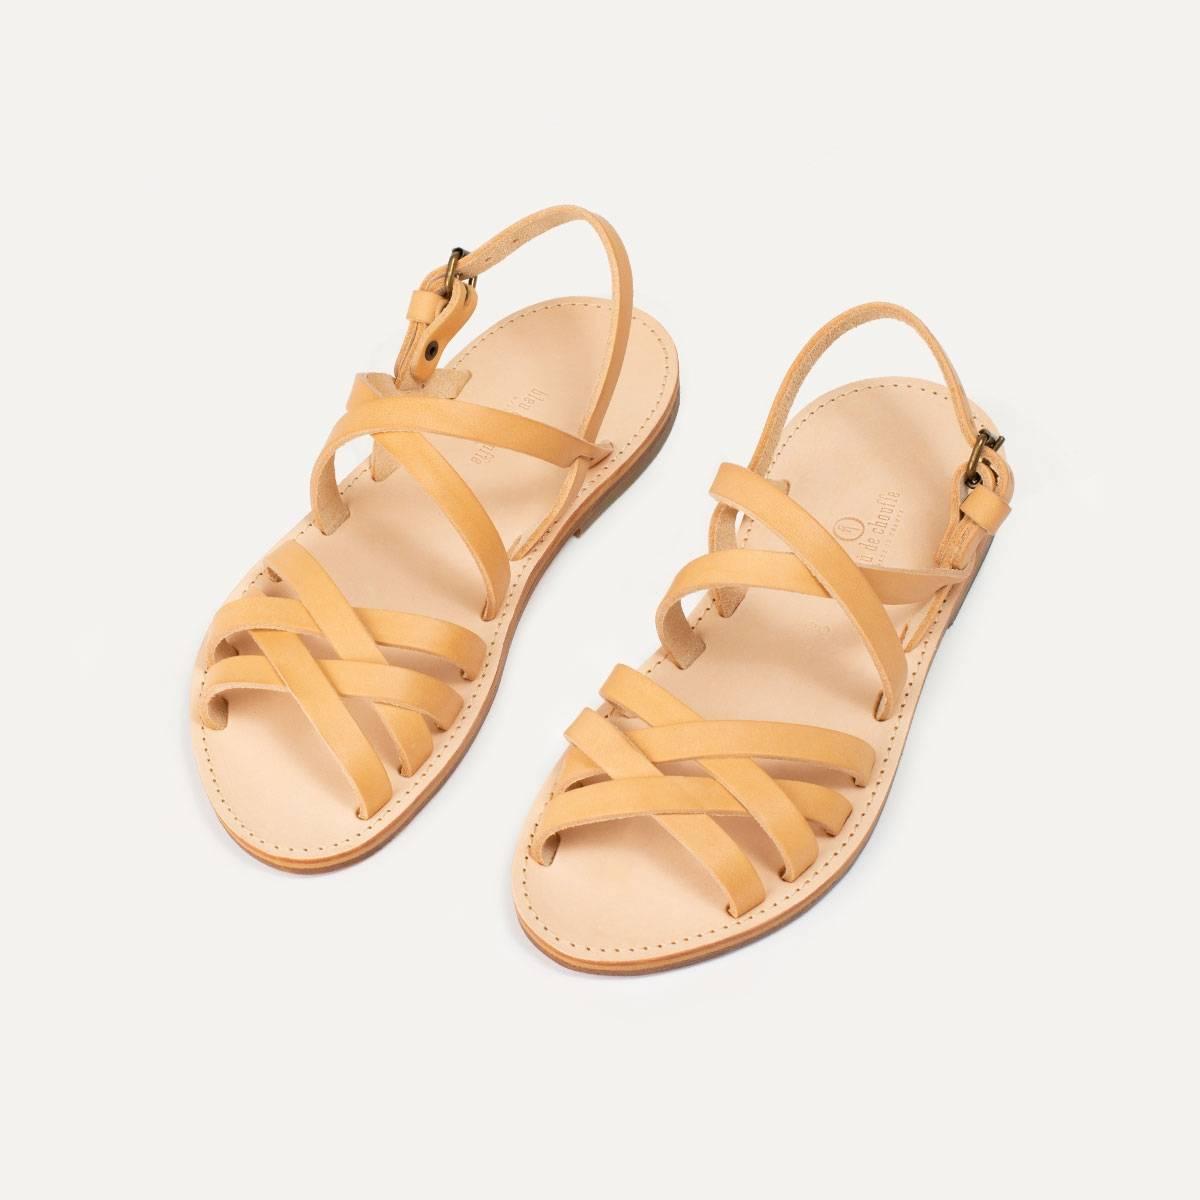 Sandales cuir Majour - Naturel (image n°4)